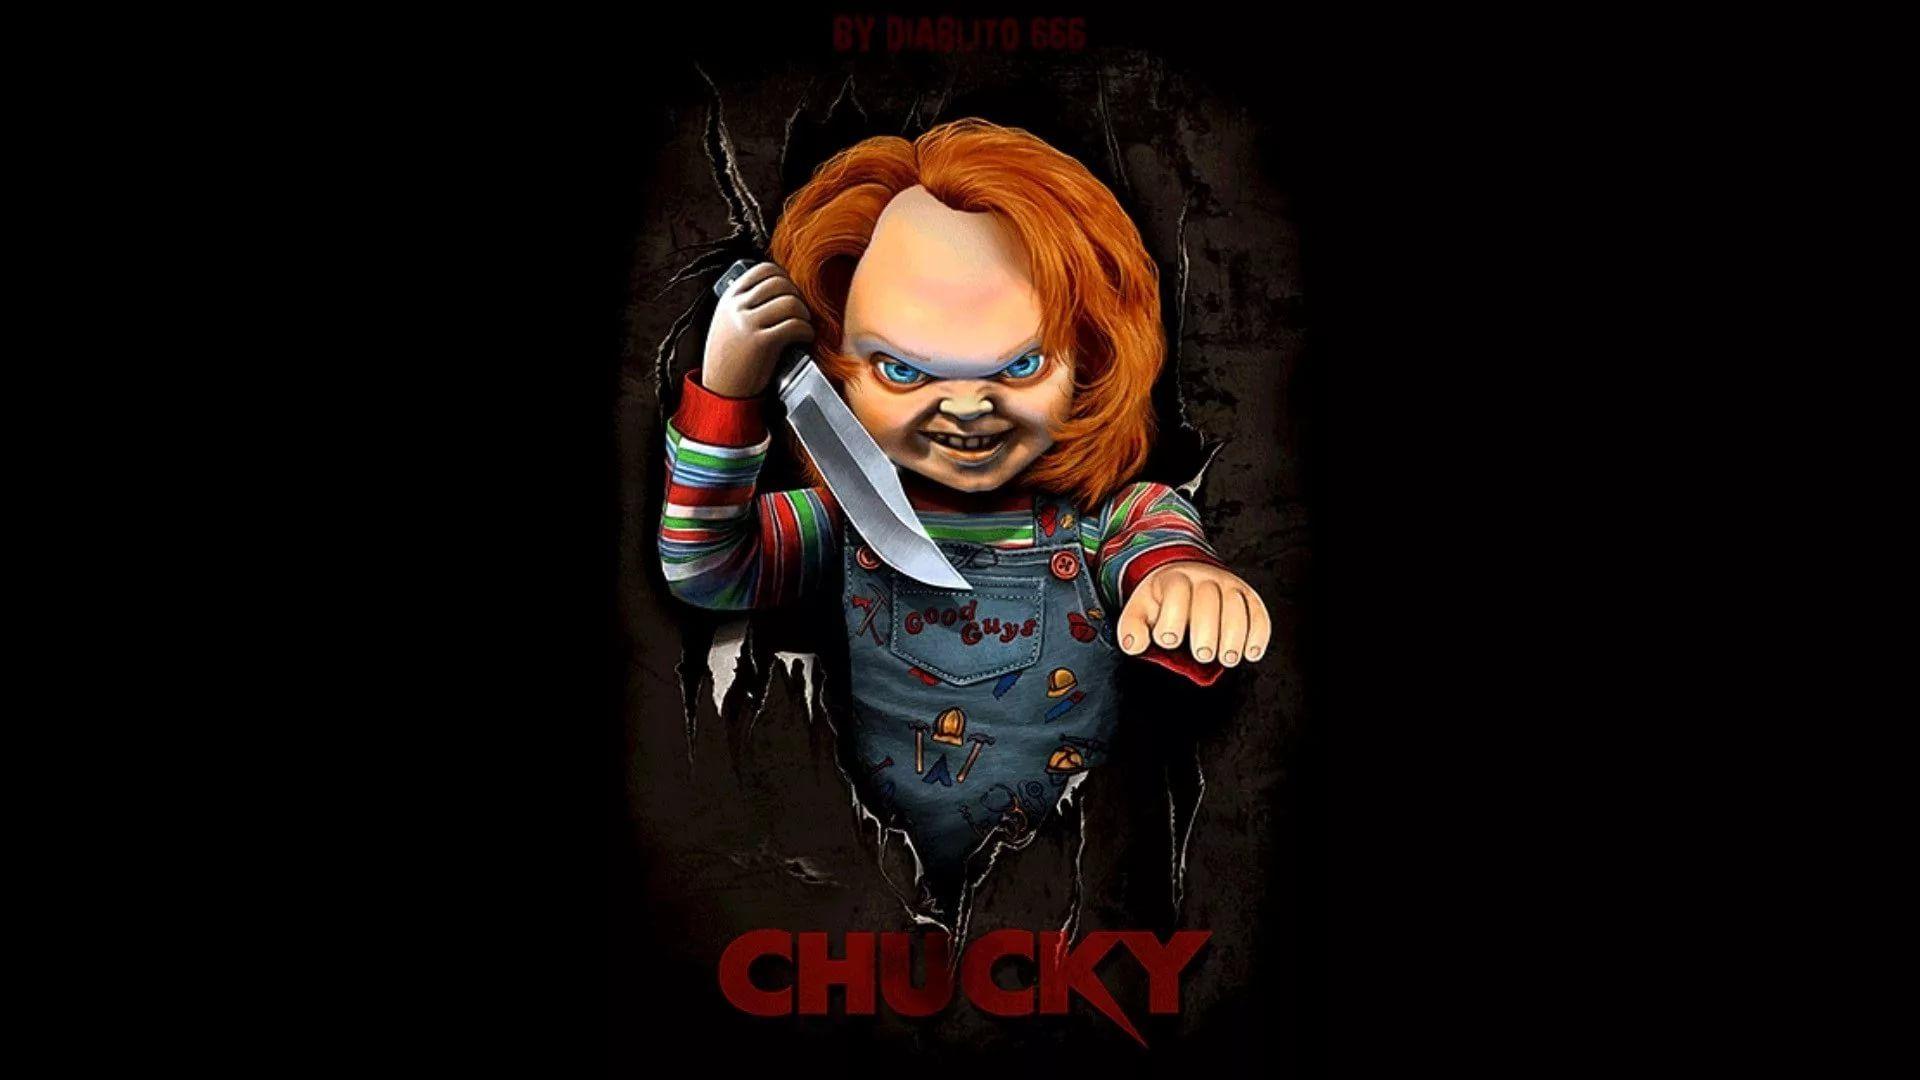 Chucky Doll wallpaper photo